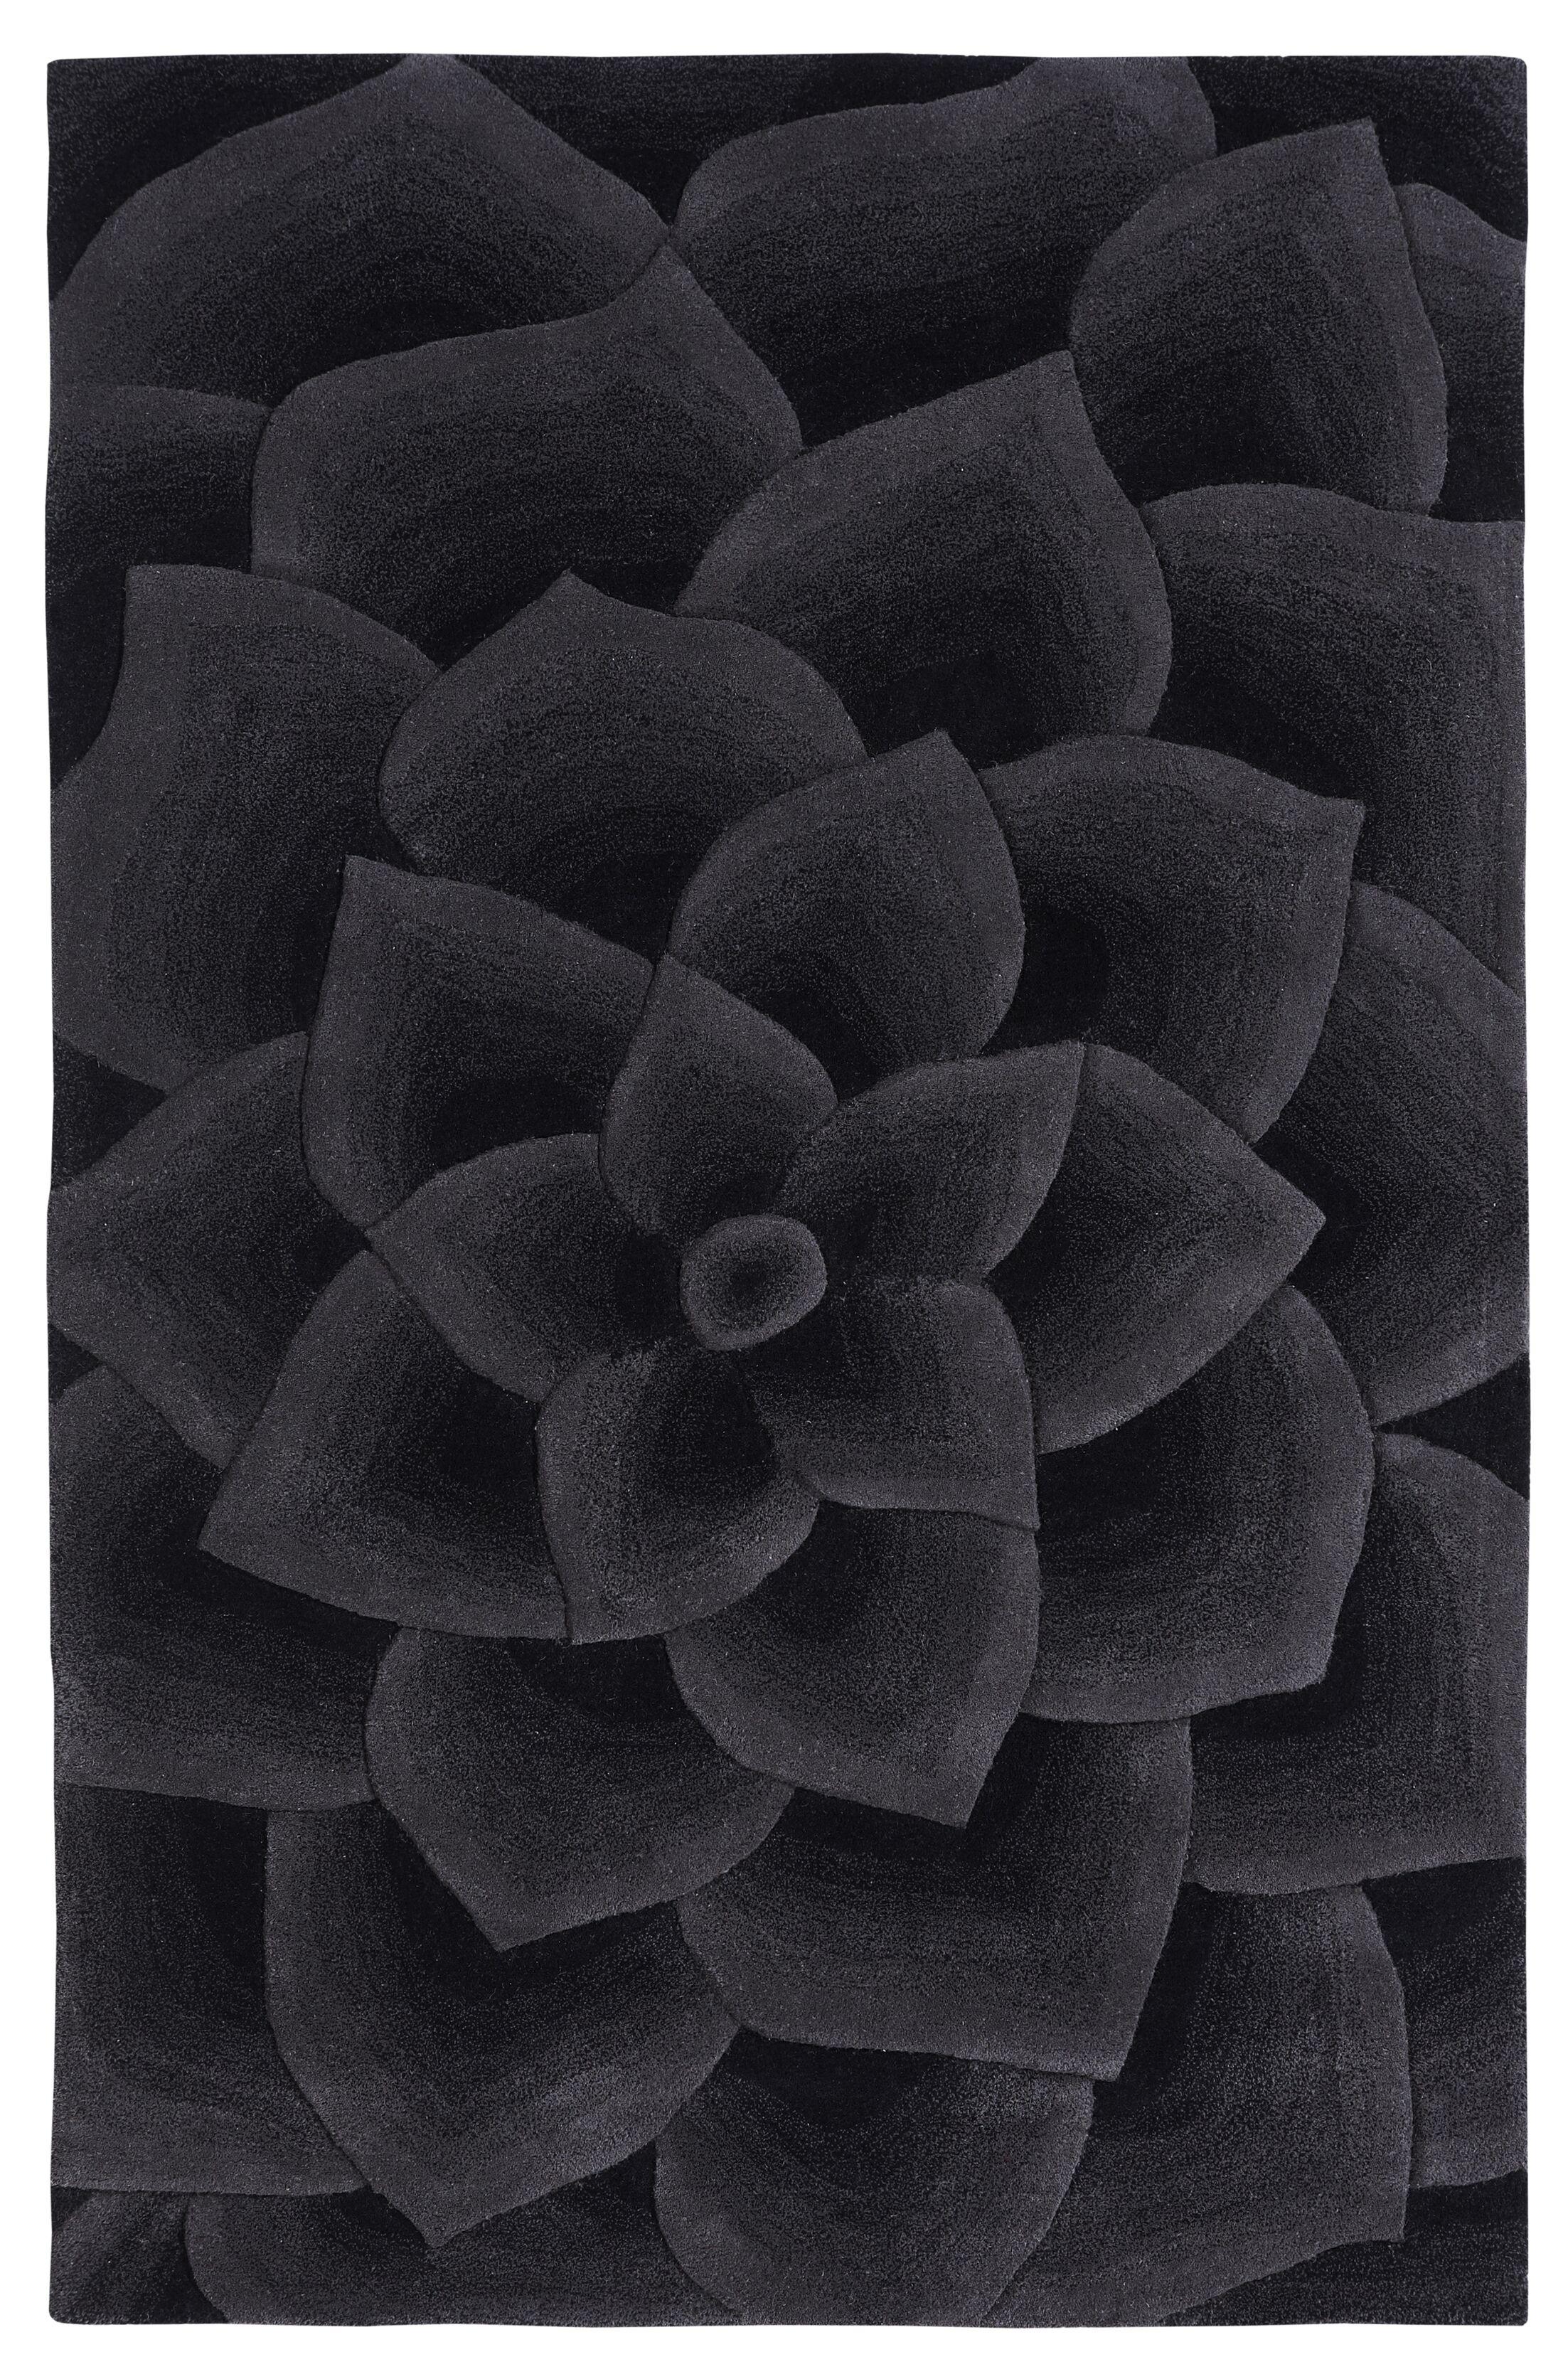 Moderna Hand-Tufted Charcoal Area Rug Rug Size: Rectangle 7'6